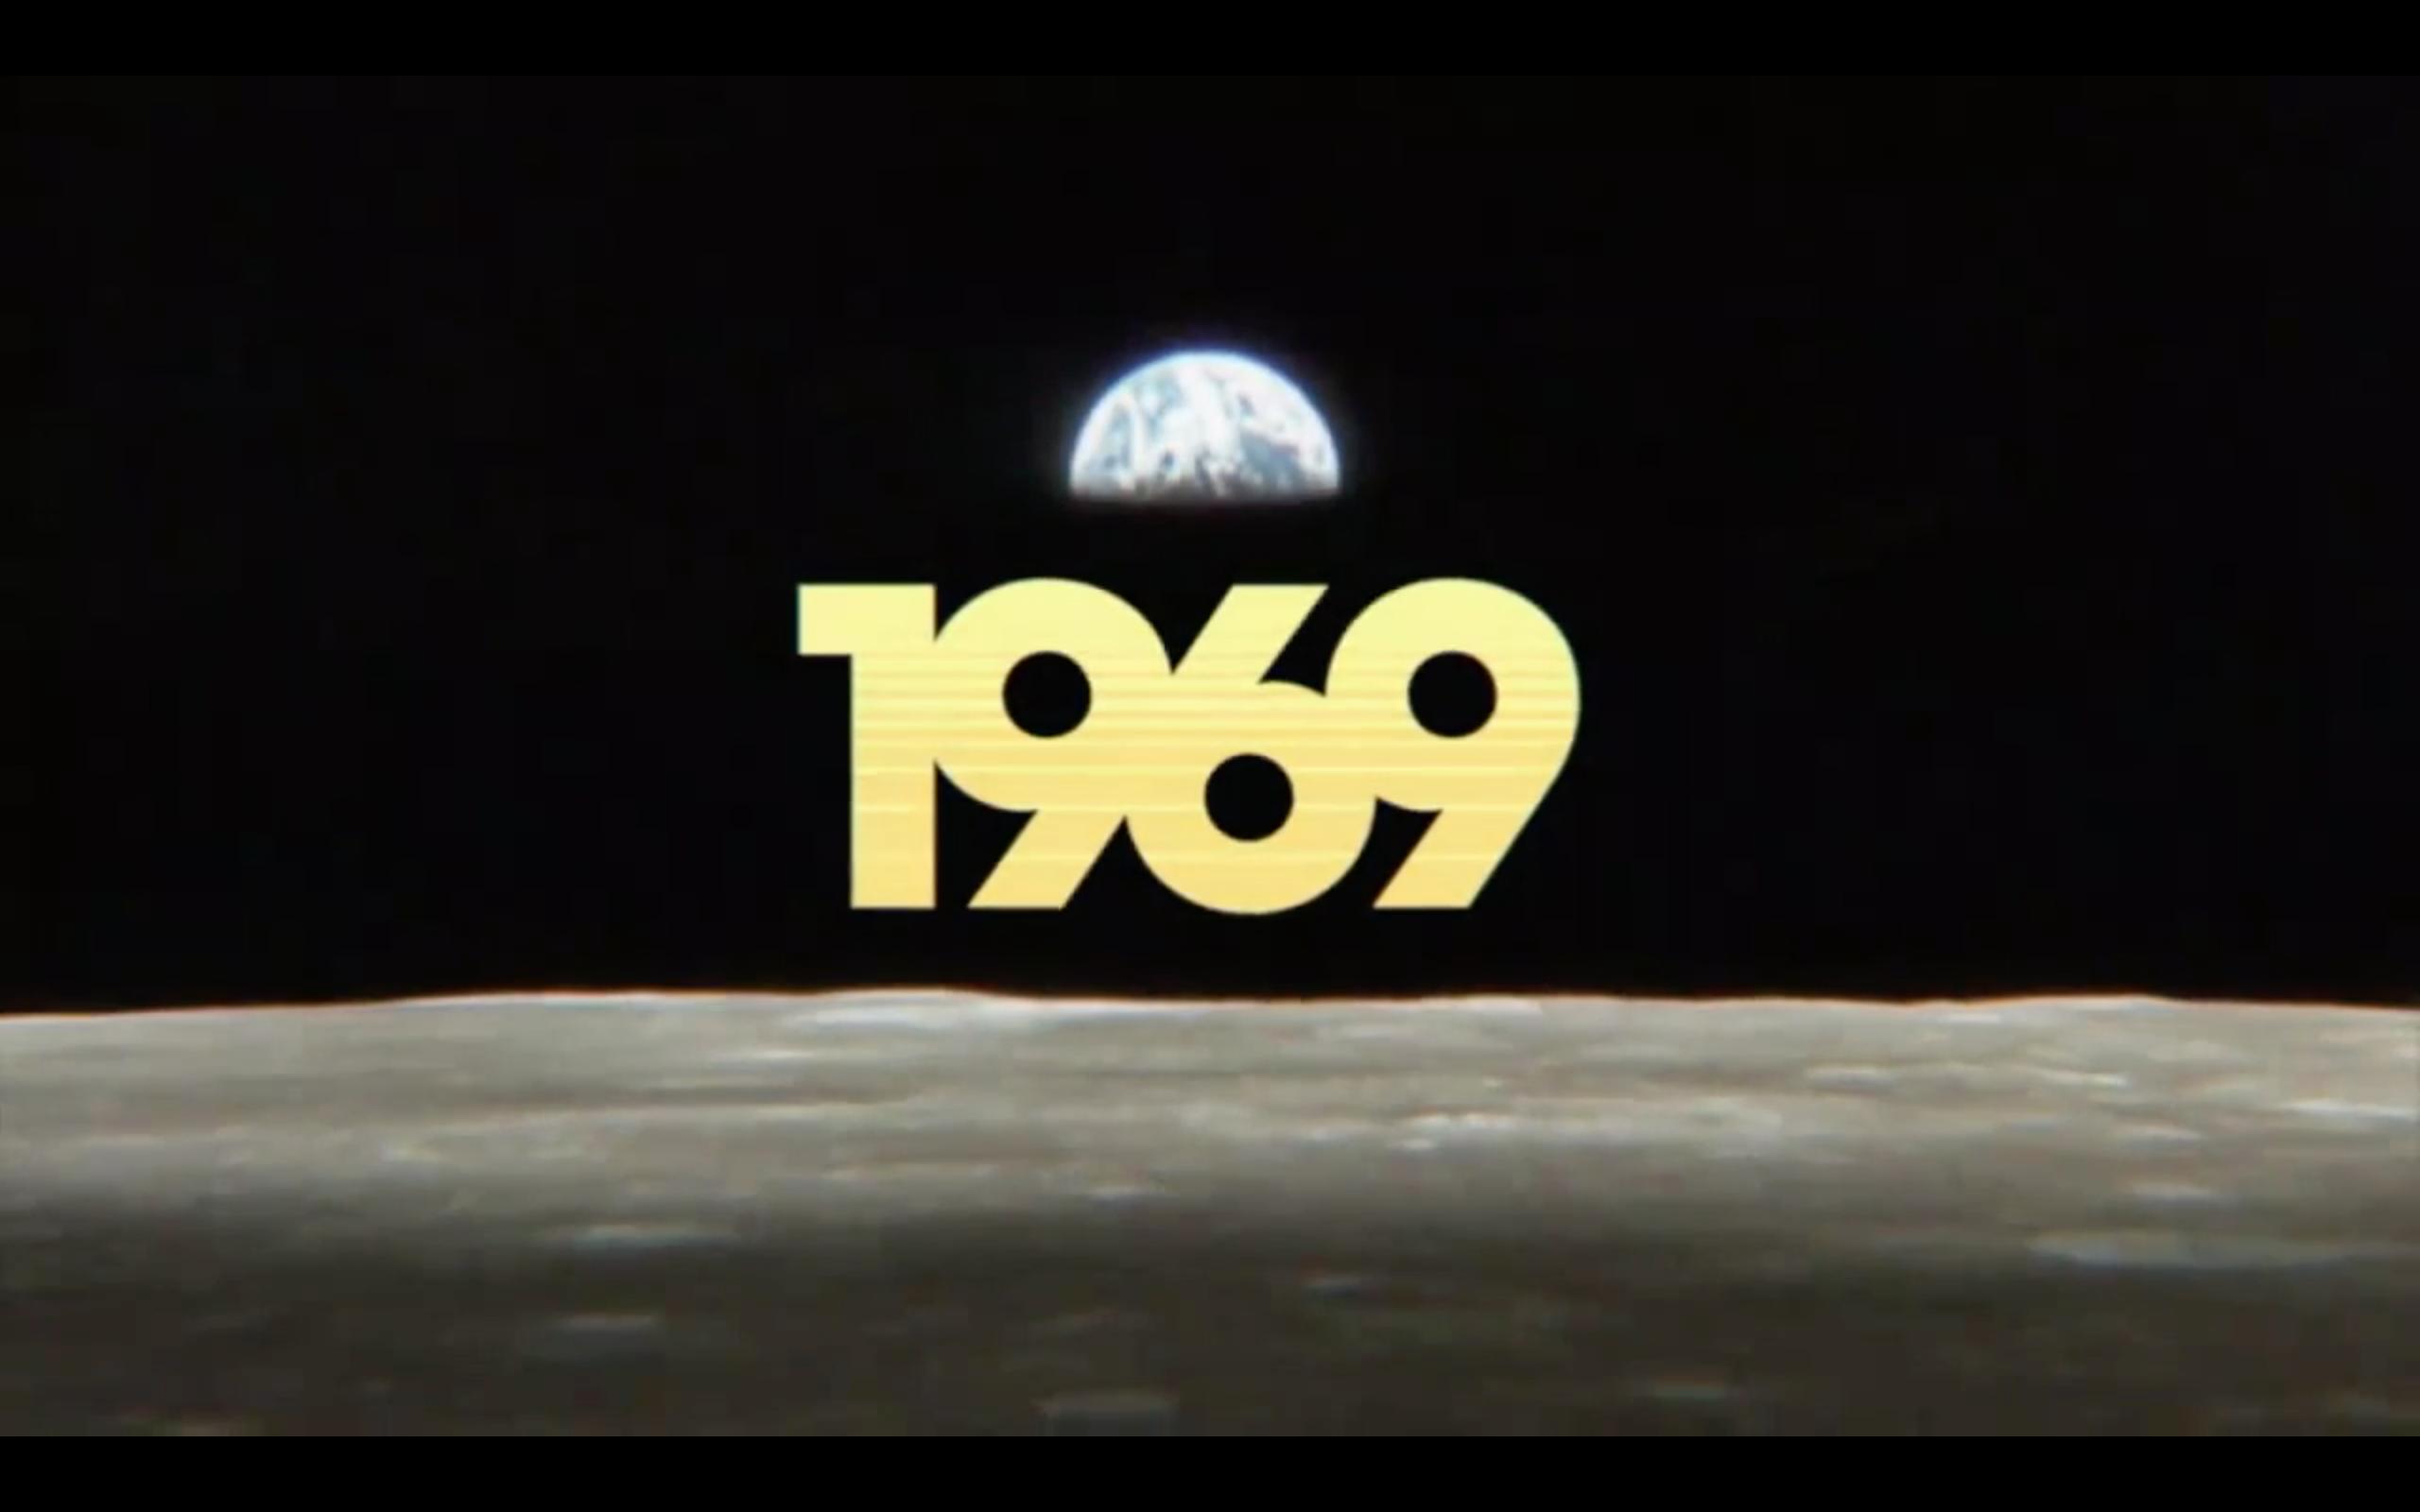 1969 (TV Series 2019) - IMDb